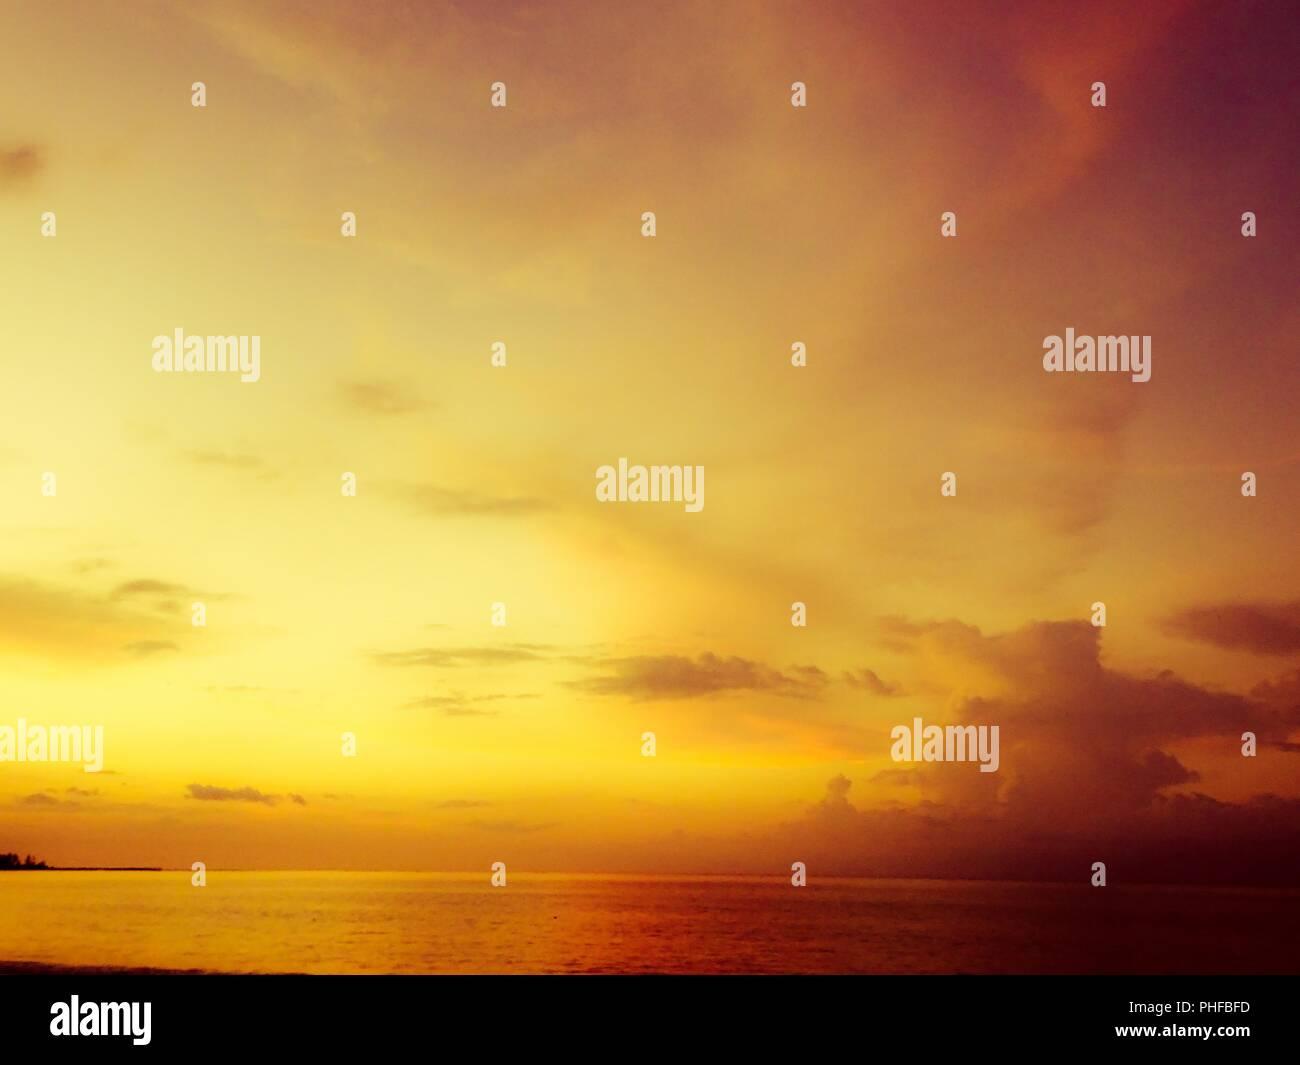 Beautiful sunrises and sunsets - Stock Image